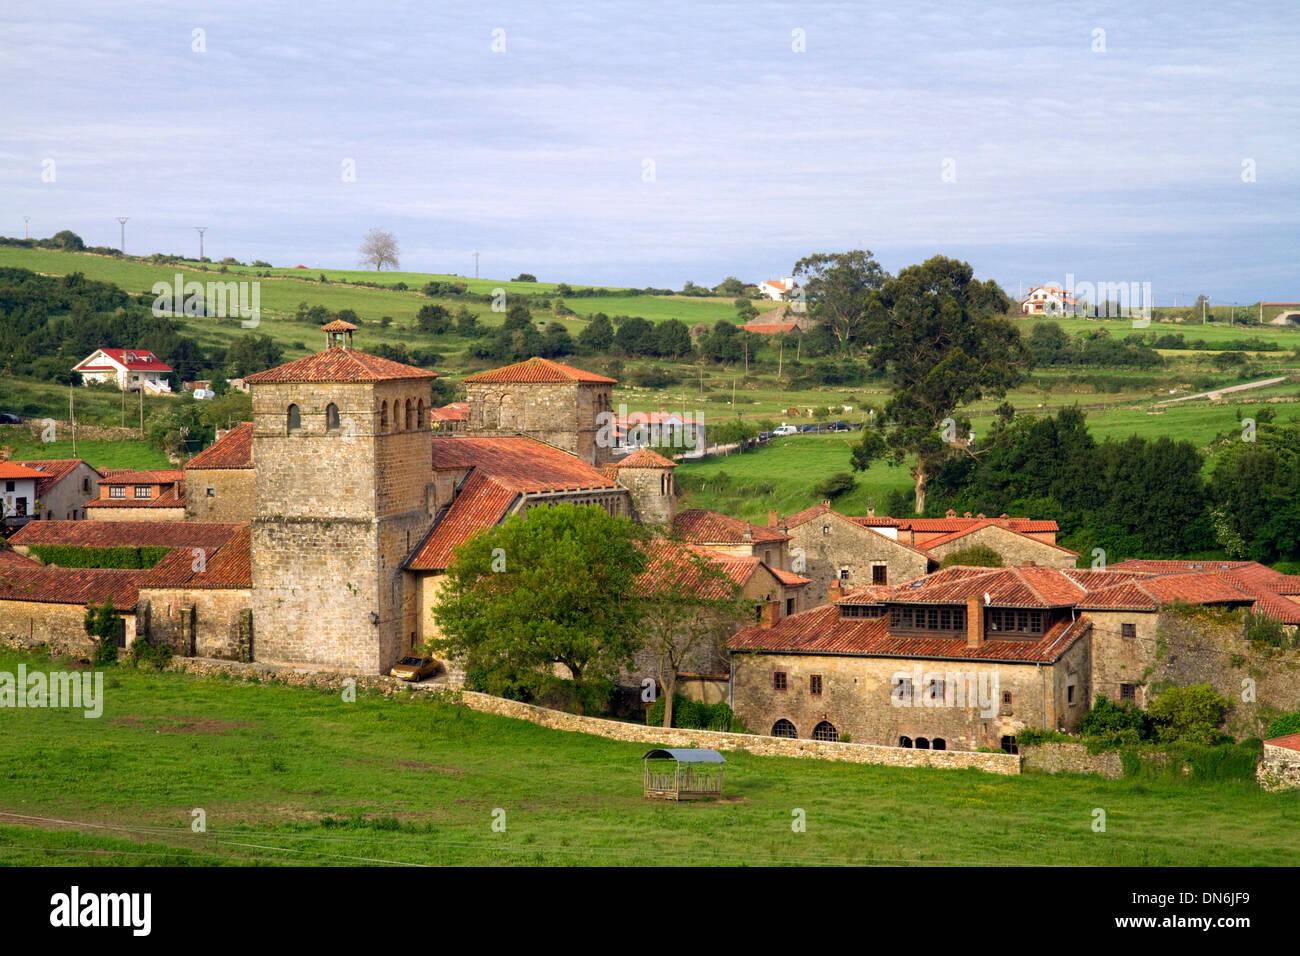 Church of the Colegiata at Santillana del Mar, Cantabria, Spain. - Stock Image